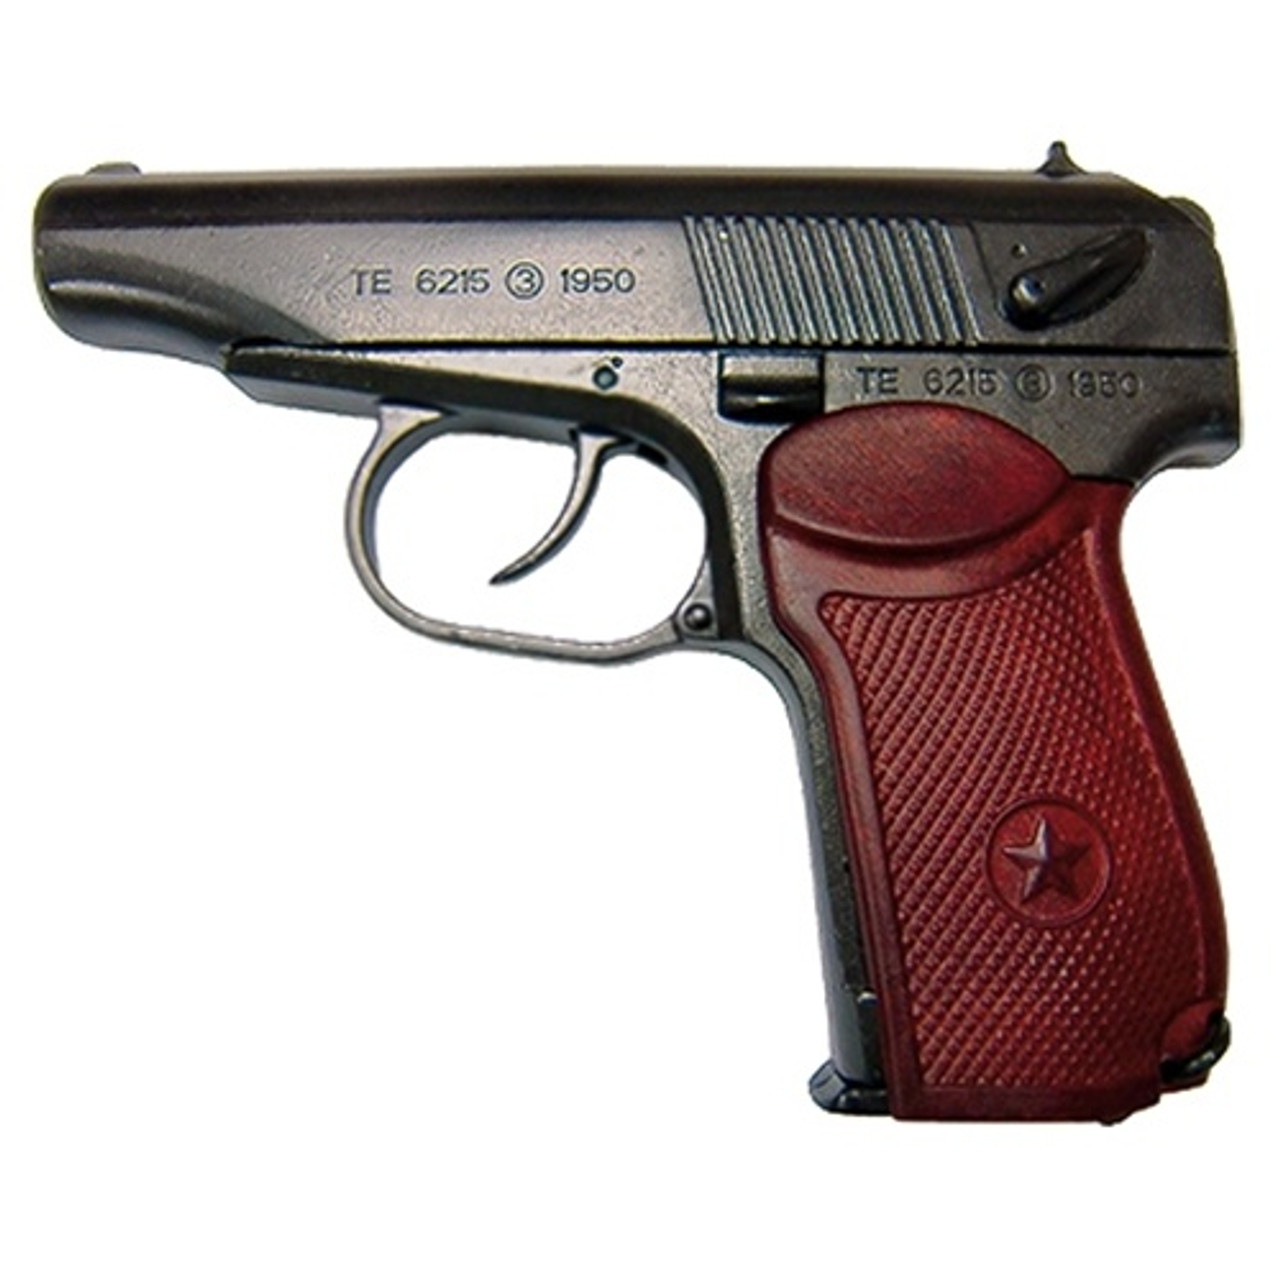 9mm Makarov Pistol from Hessen Antique